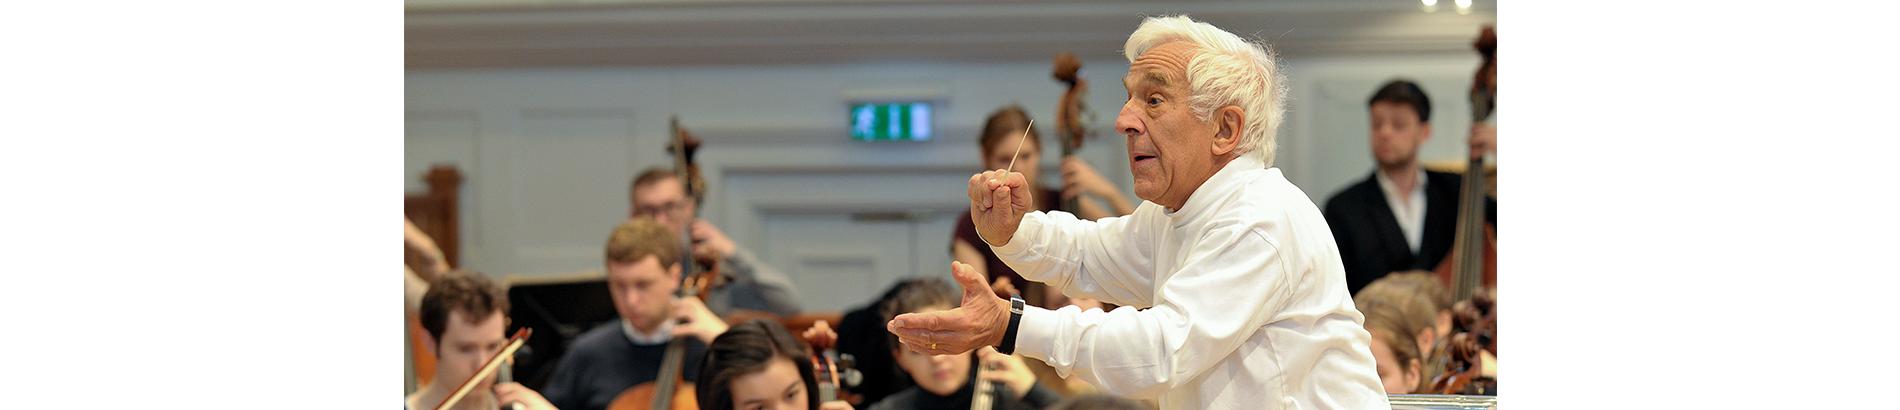 Vladimir Ashkenazy conducts Debussy's La Mer